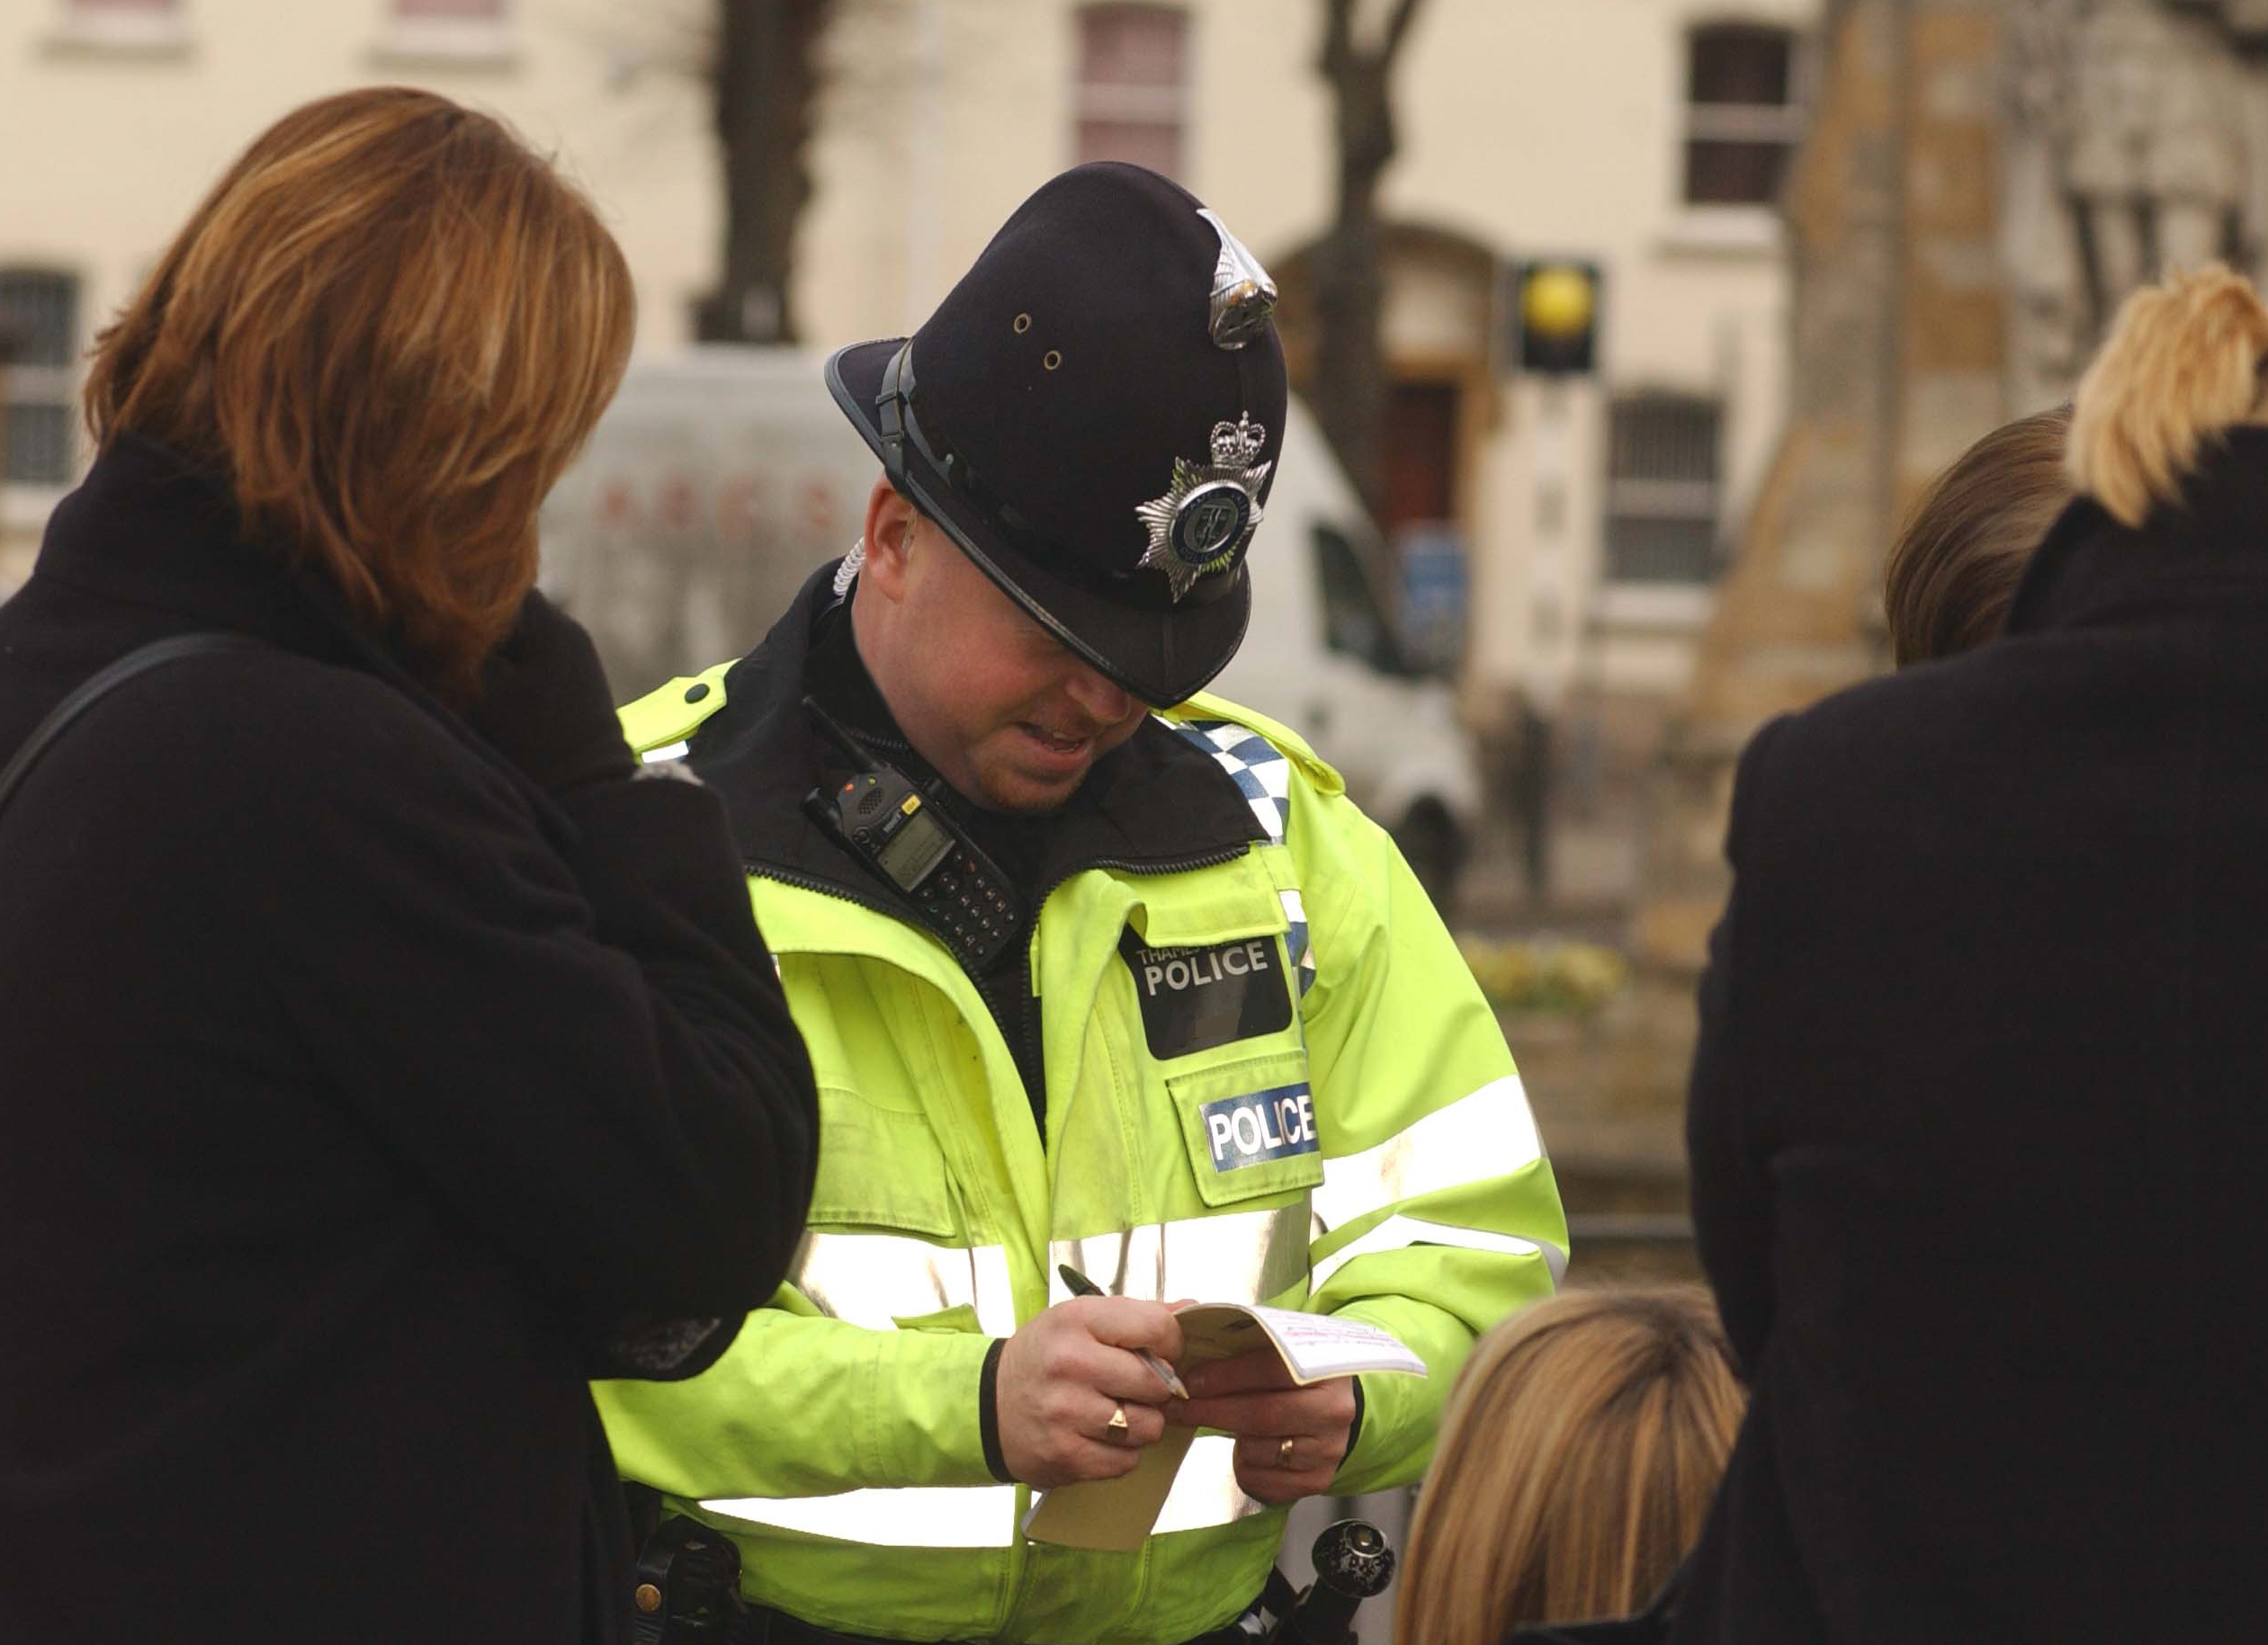 Thames Valley Police to bring back Custodian Helmets